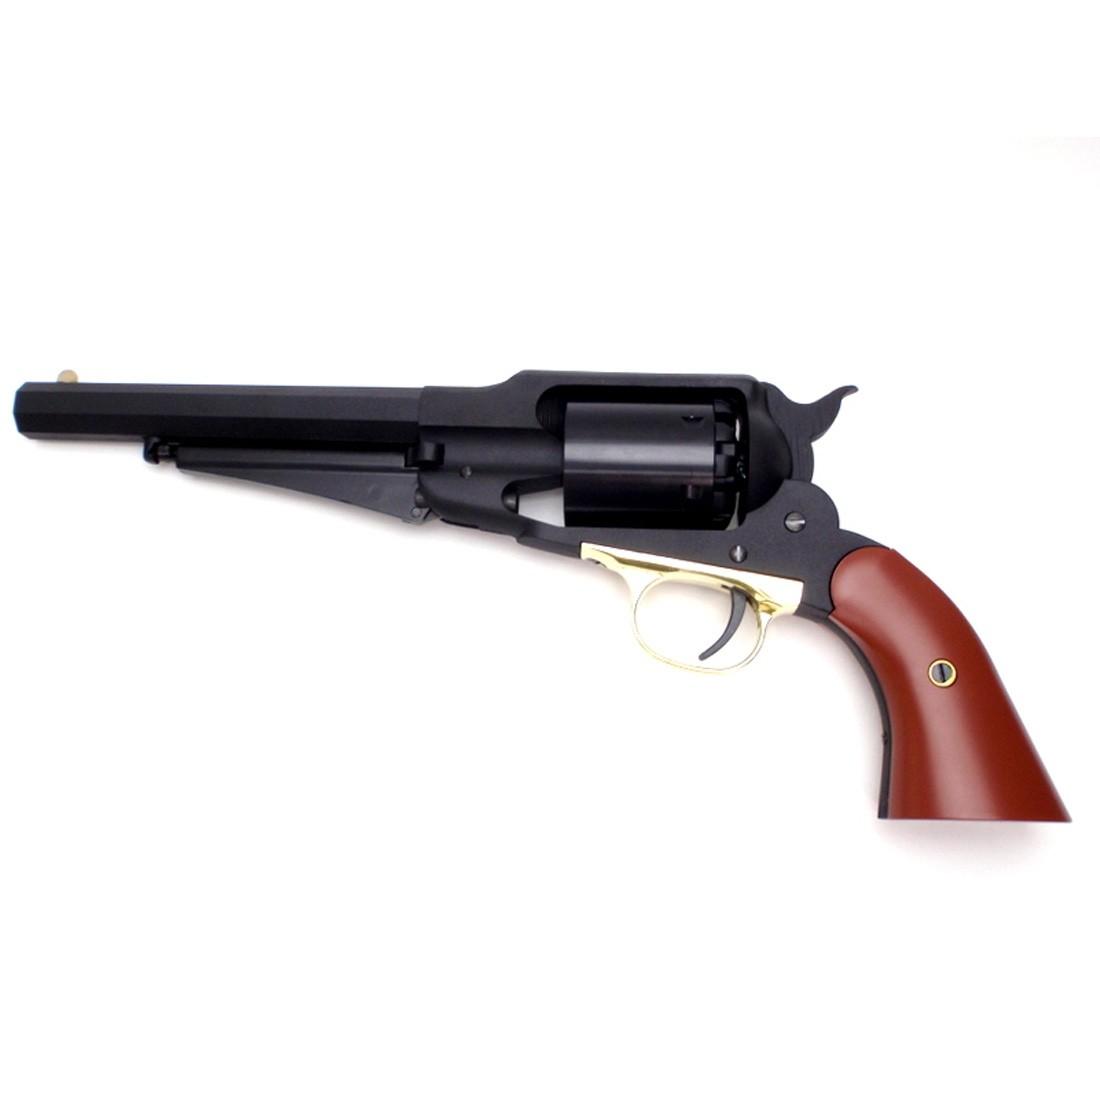 HWS Remington 1858 New Model Army (Short Version) Airsoft Gas Revolver